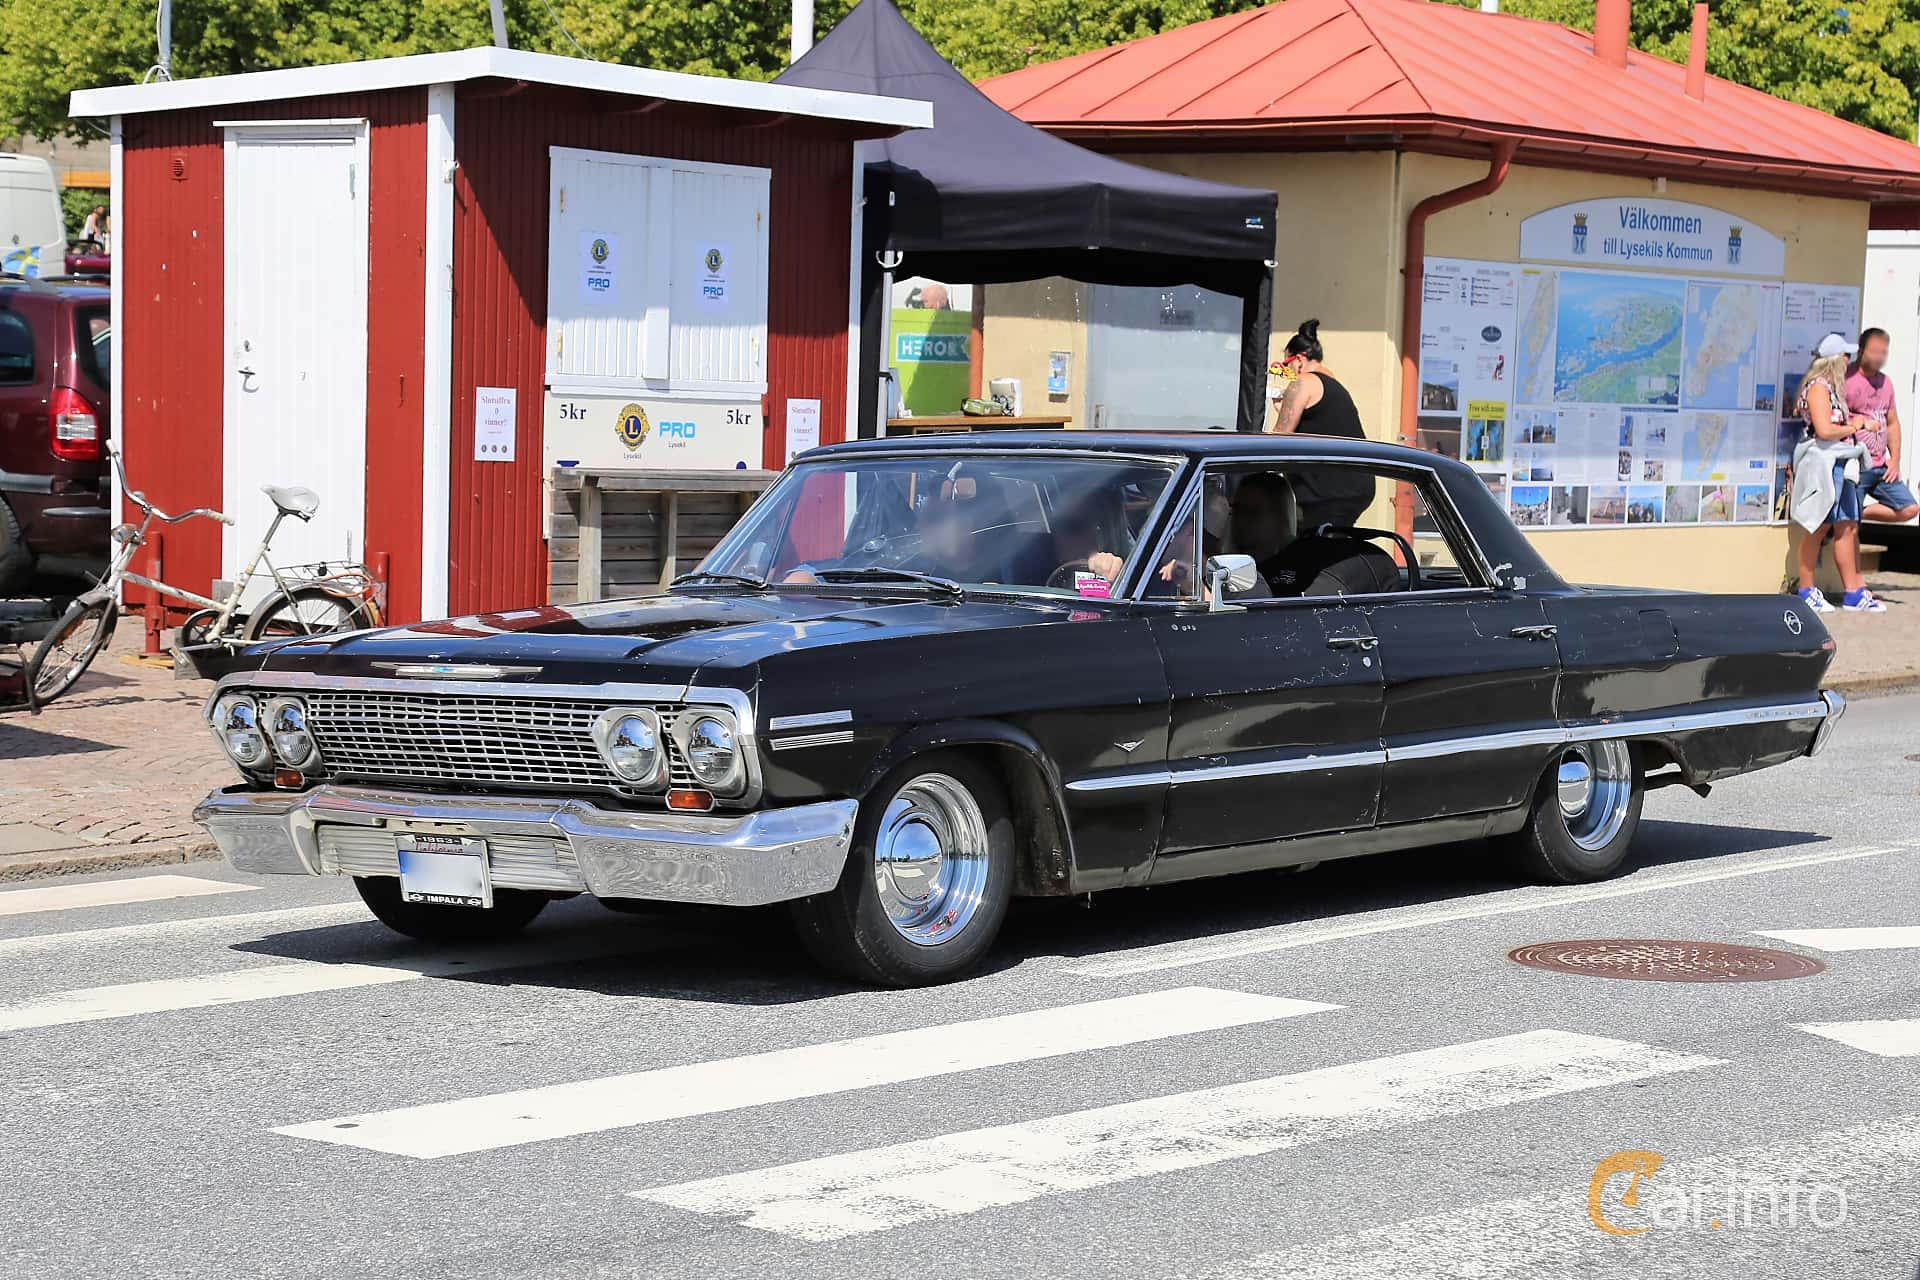 Chevrolet Impala Sport Sedan 4.6 V8 Powerglide, 198hp, 1963 at Cruising Lysekil 2018